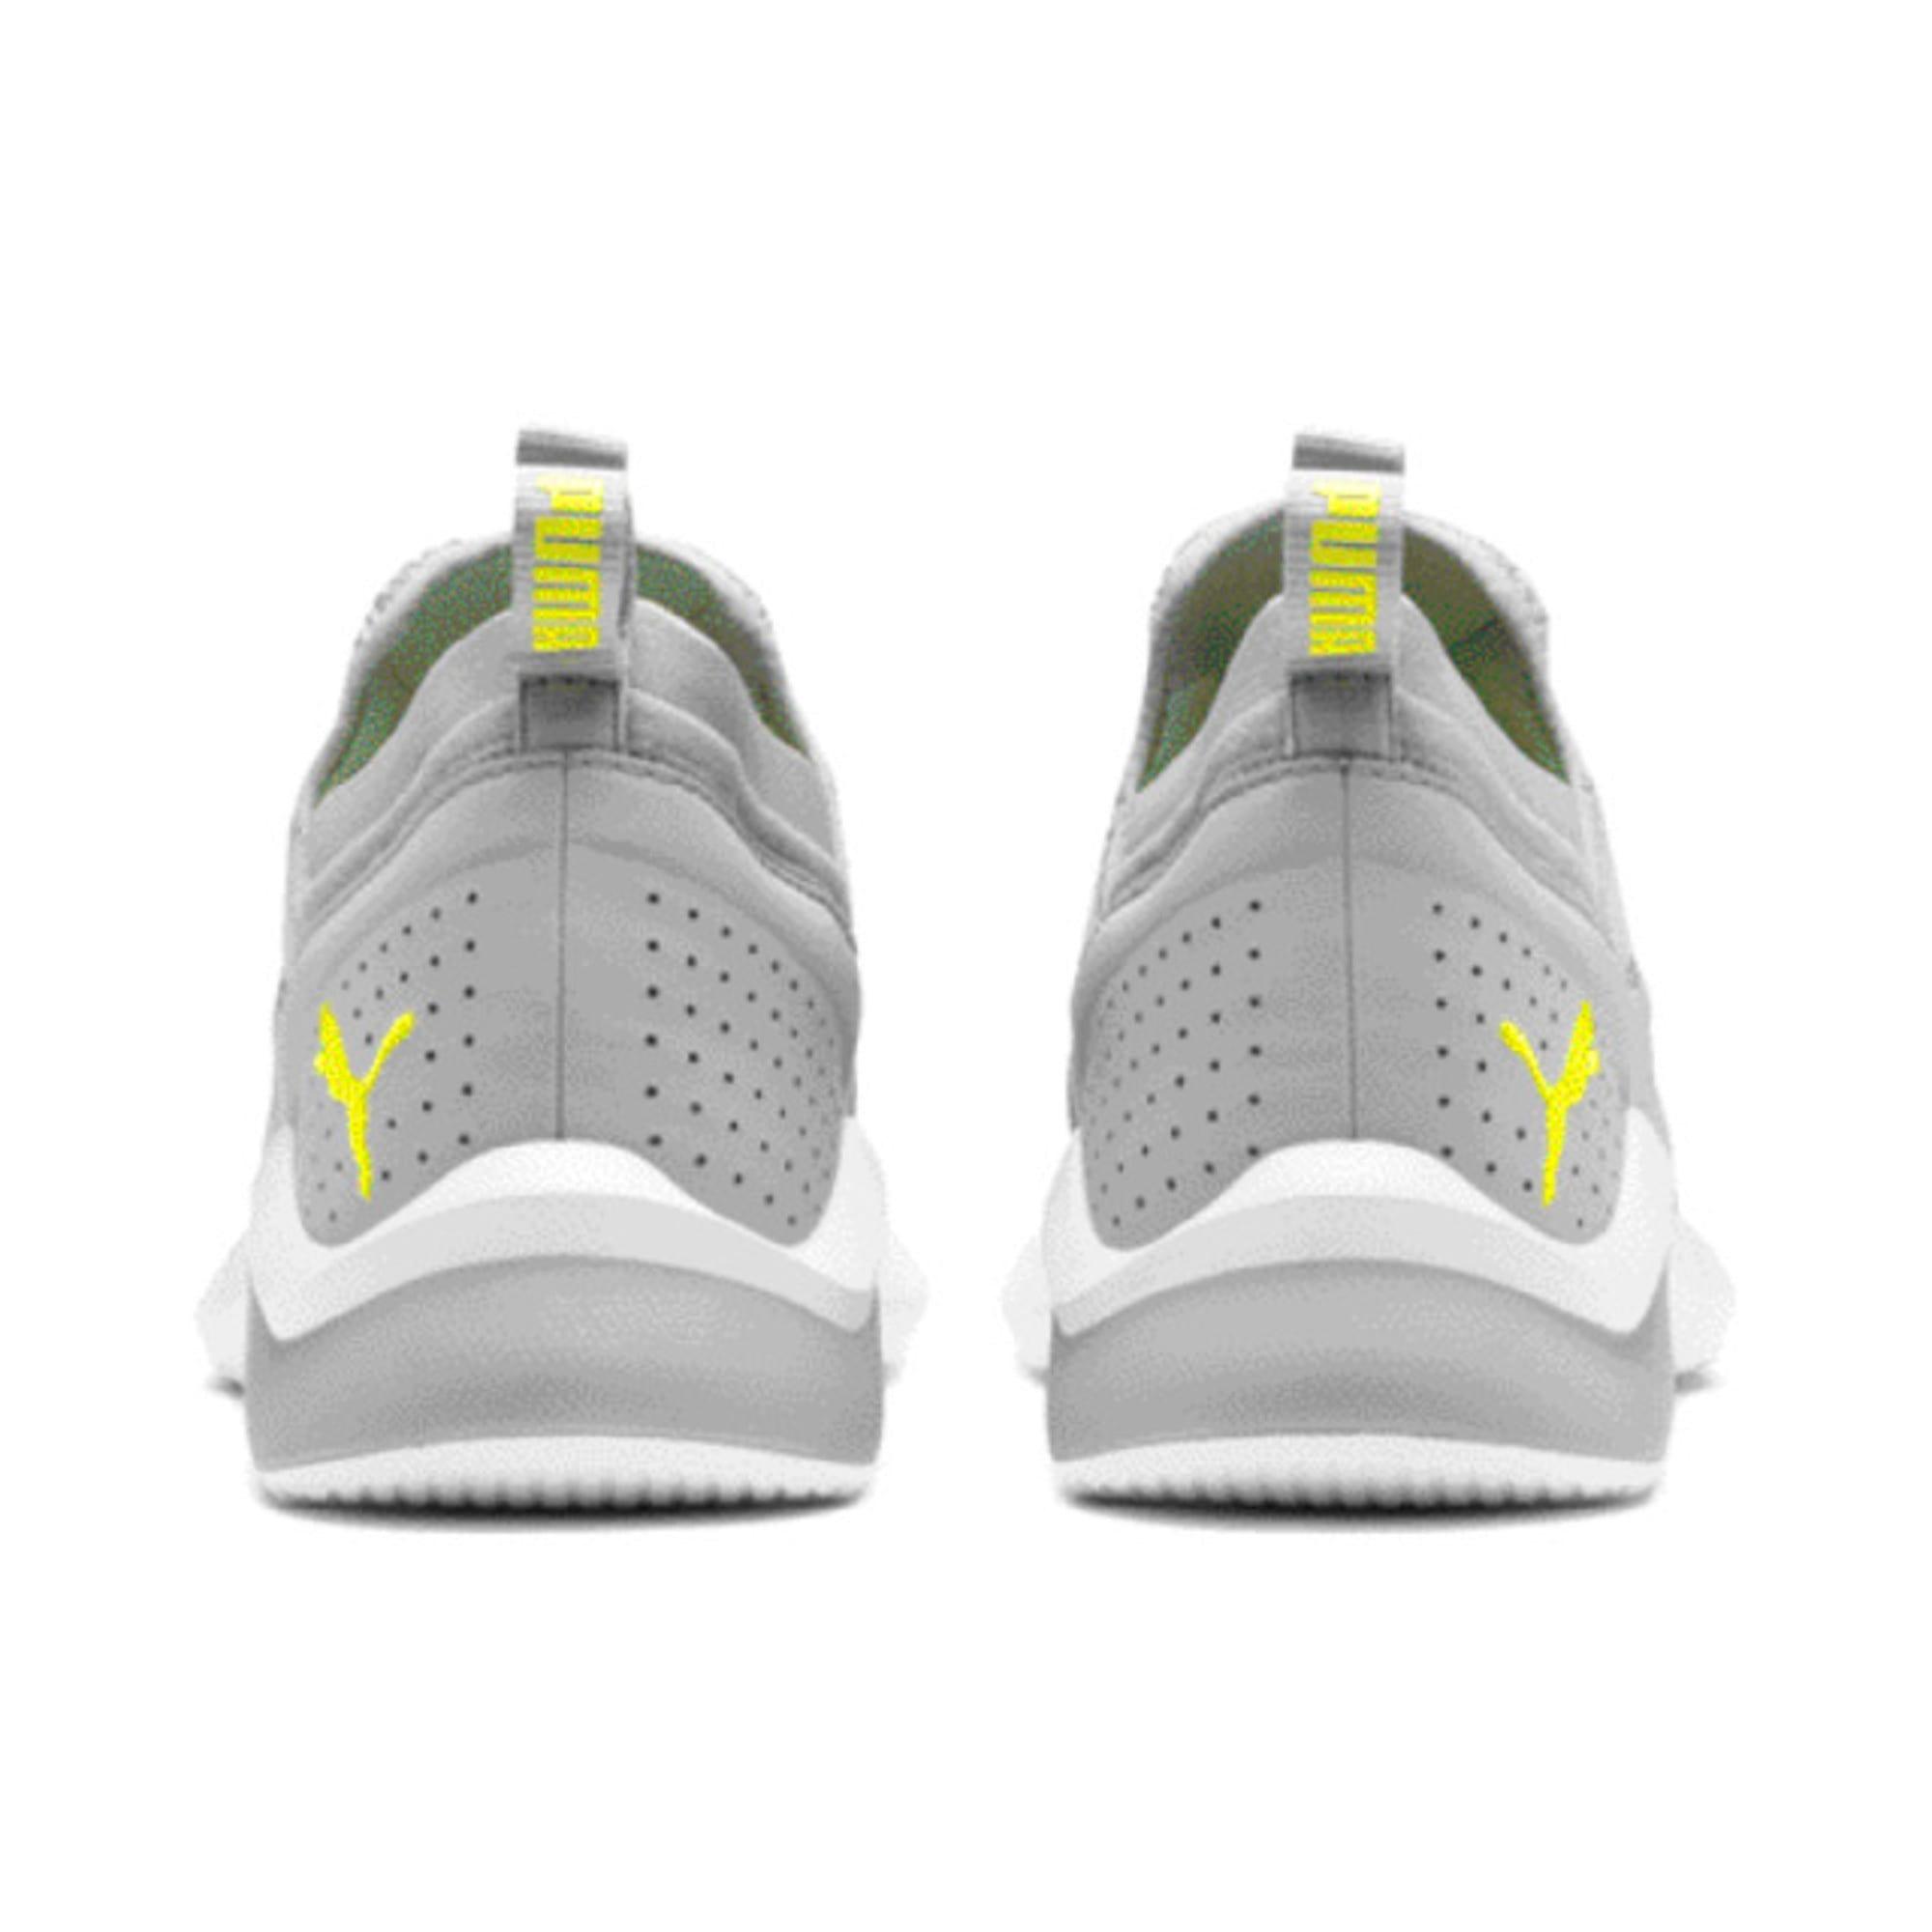 Thumbnail 6 of Emergence Lights Men's Running Shoes, High Rise-Yellow Alert, medium-IND